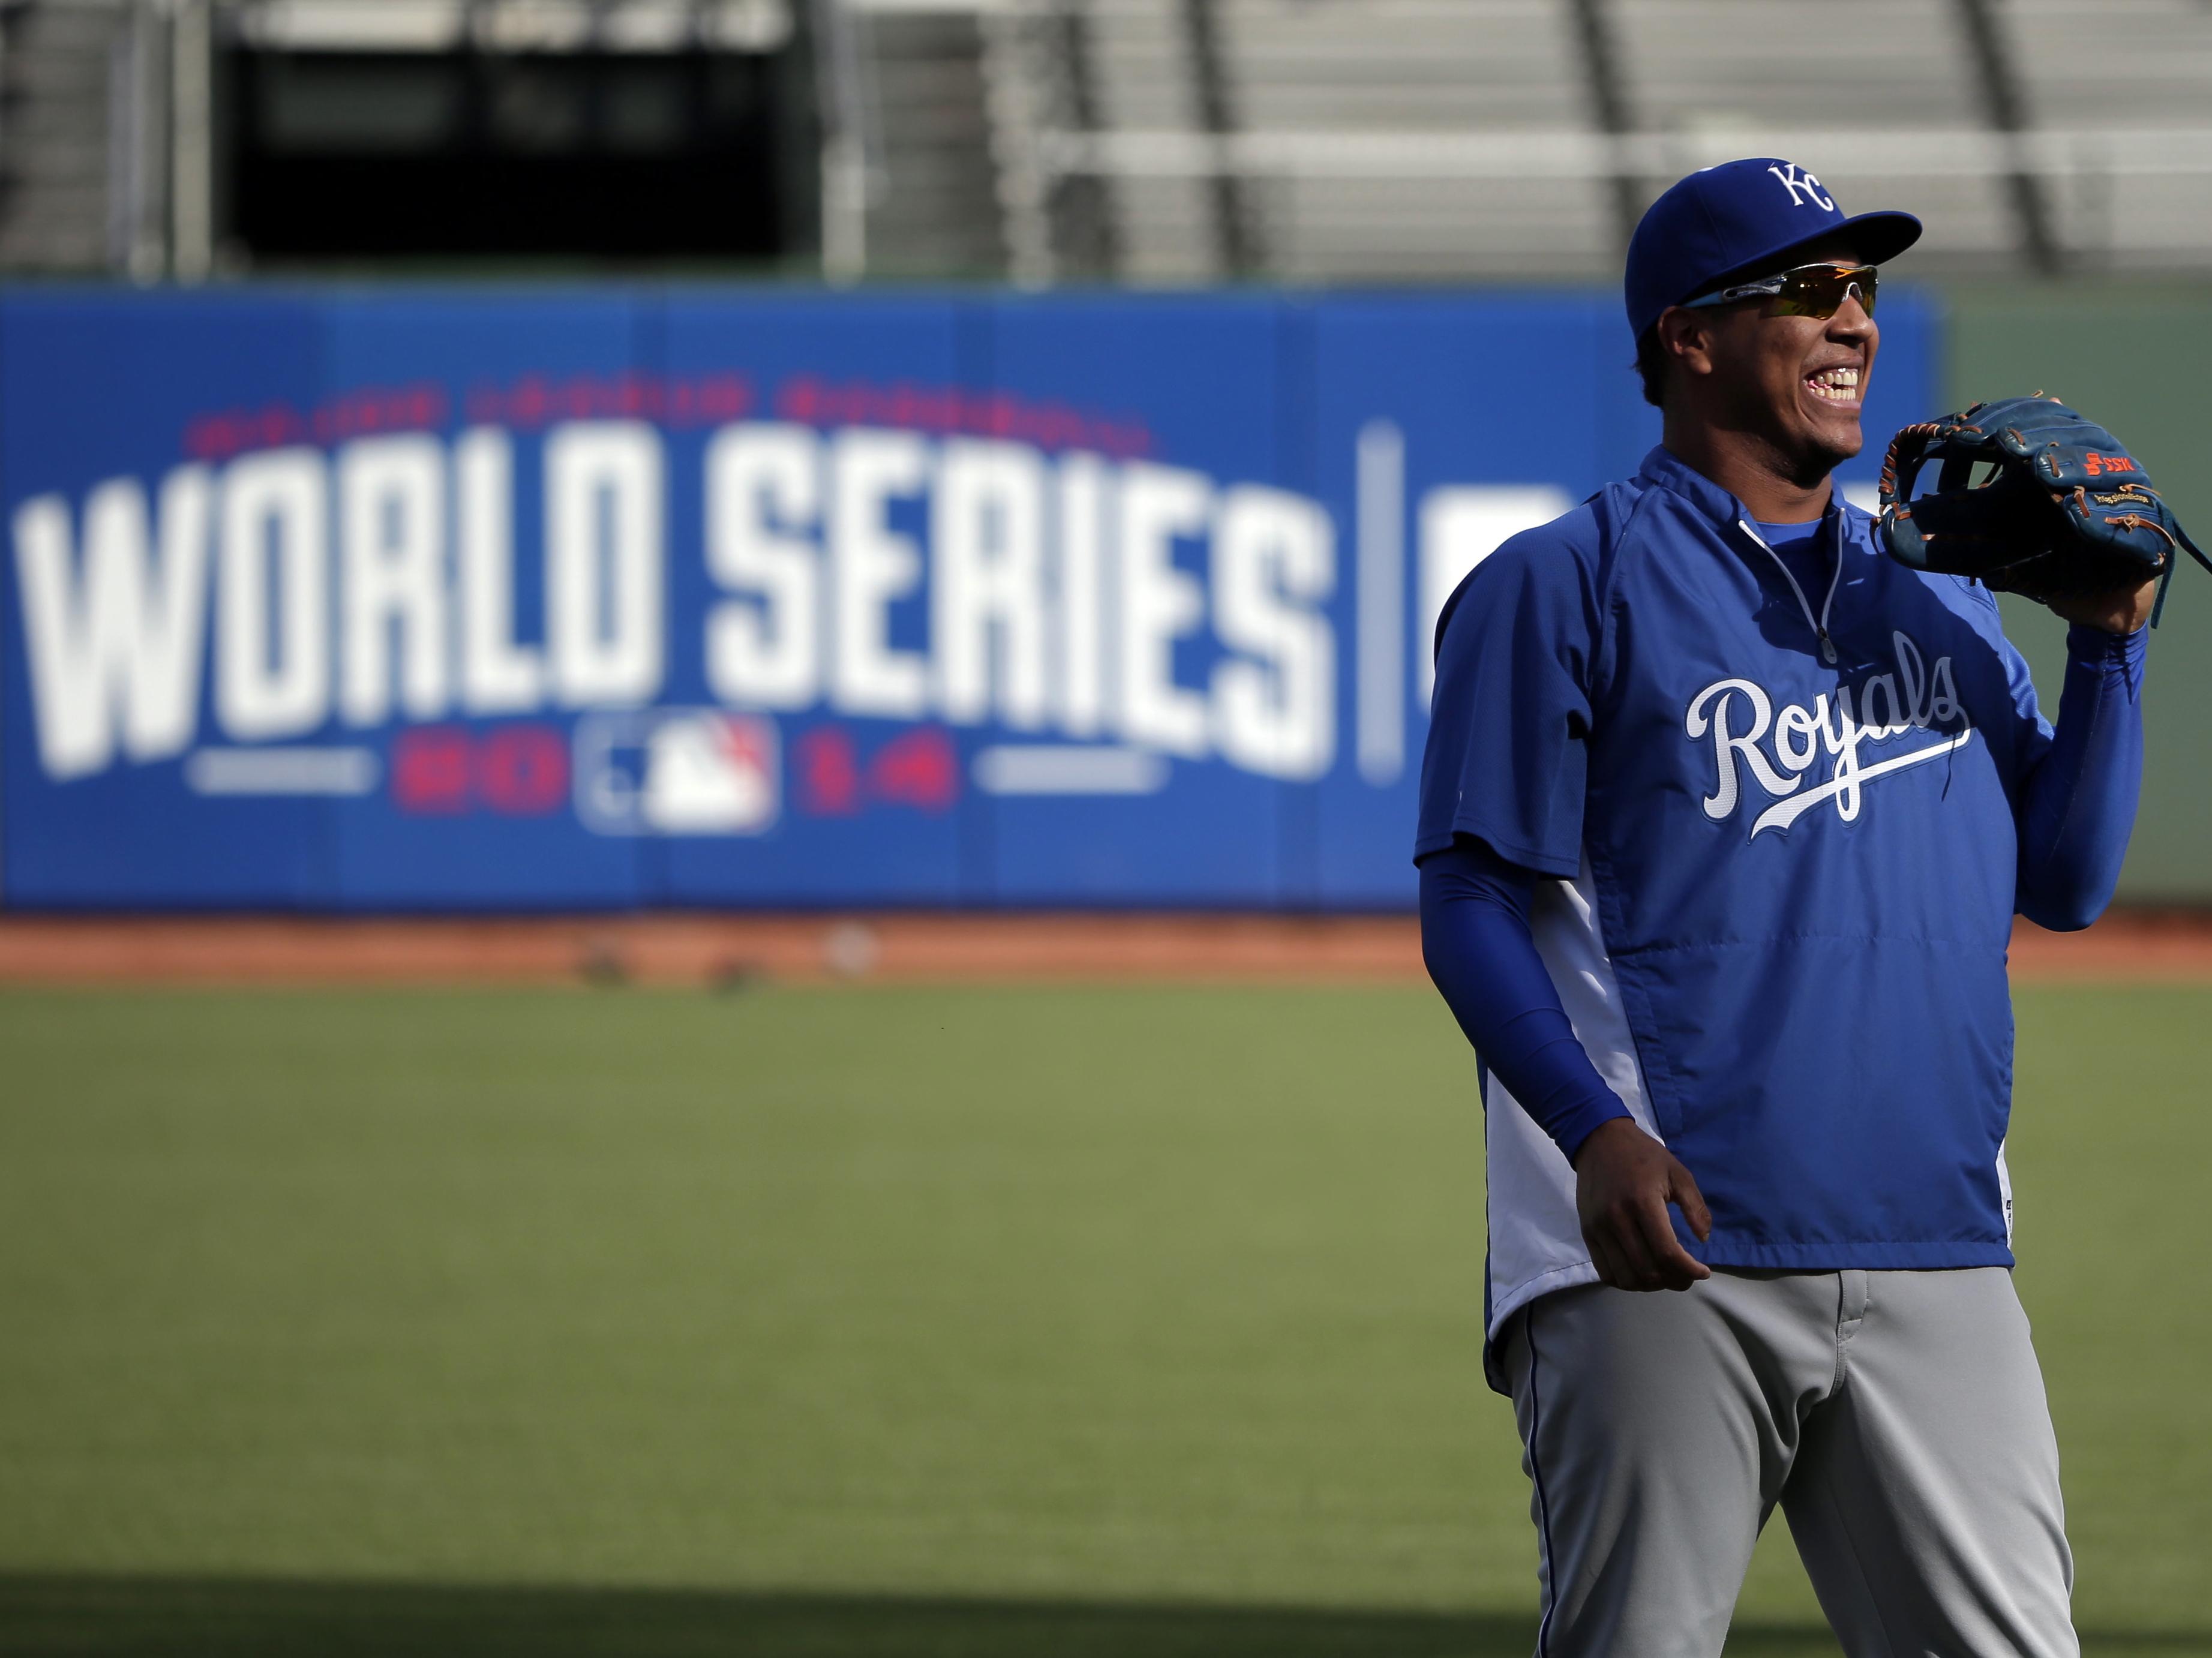 World Series Royals Giants Baseball